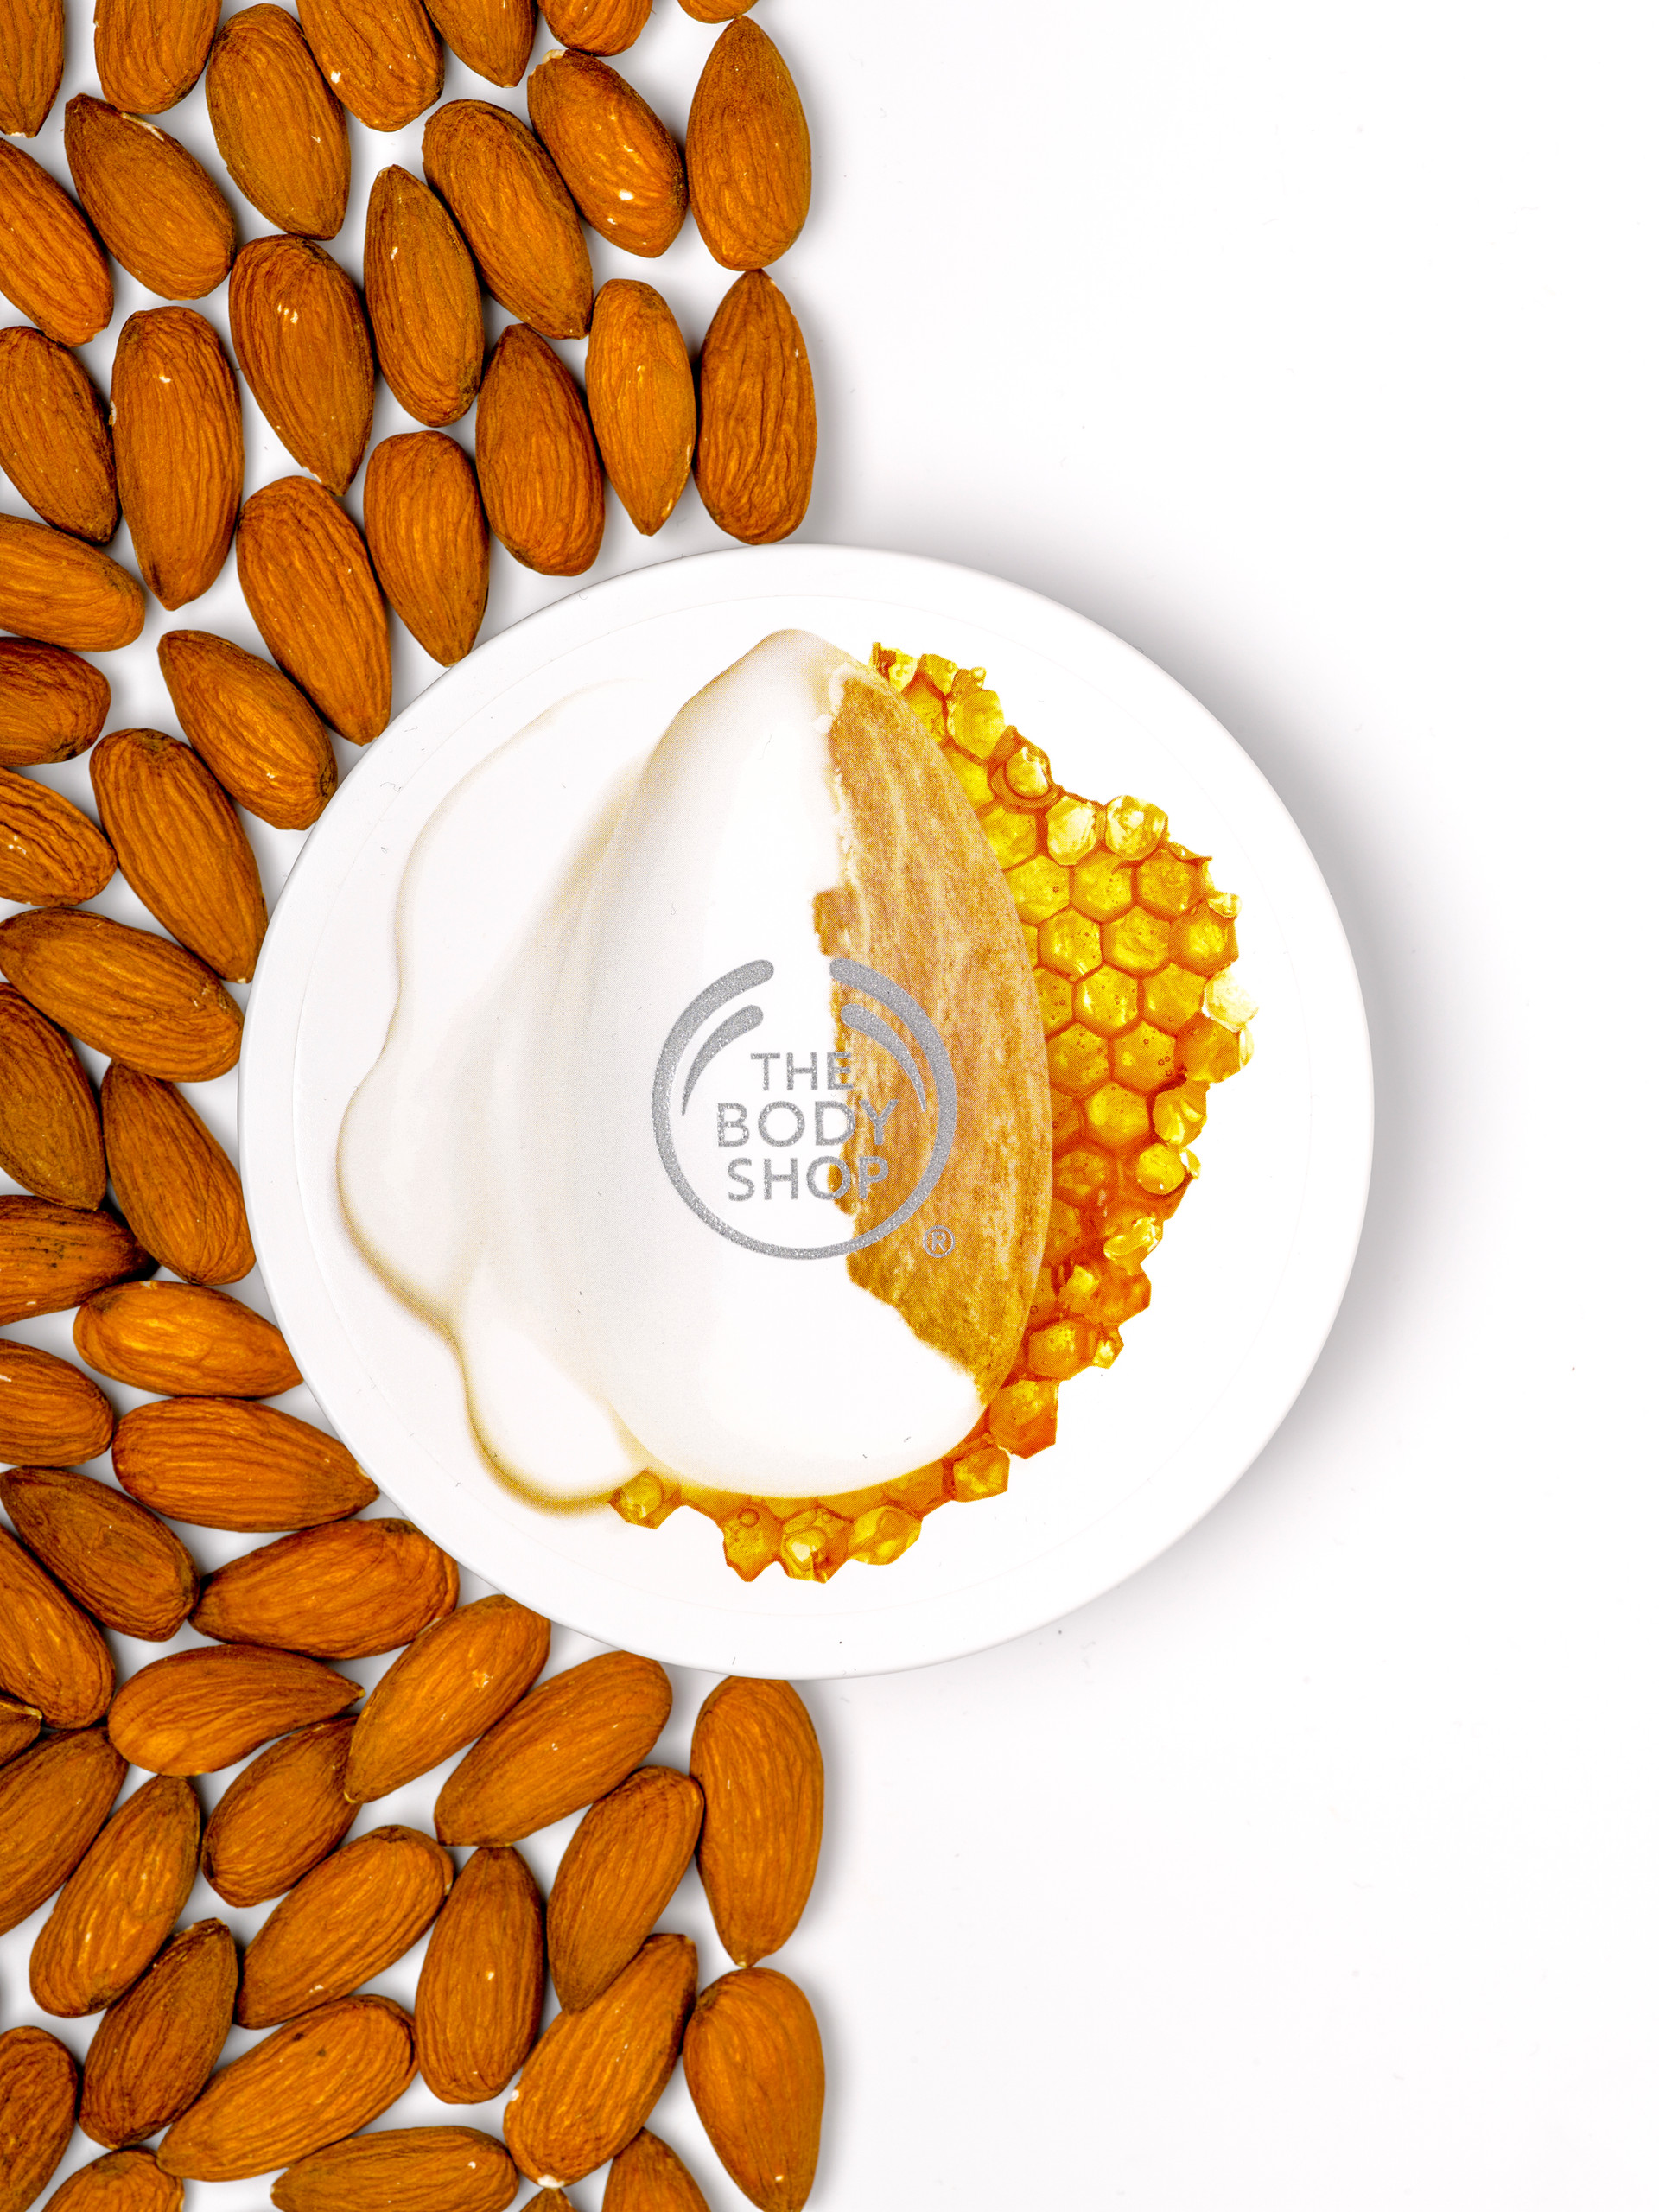 BodyShop Almond and Honey Body Butter